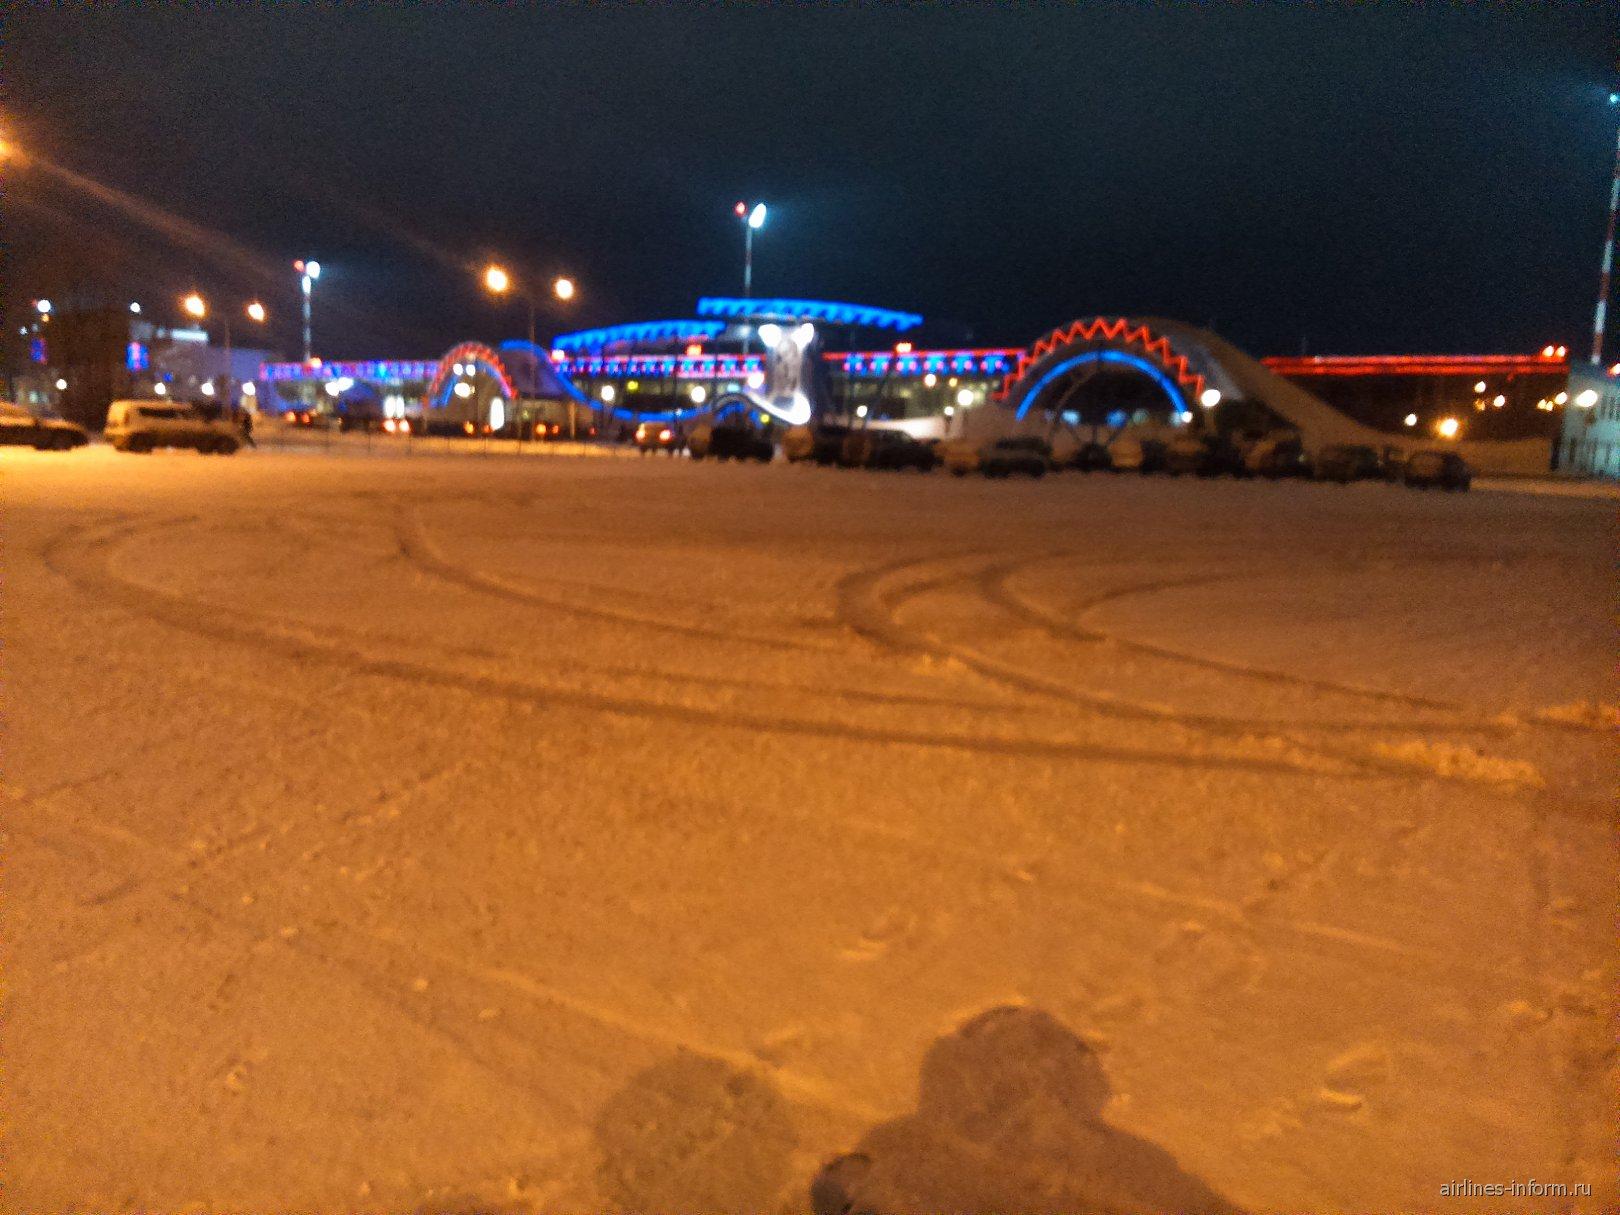 Аэропорт Сургут ночью